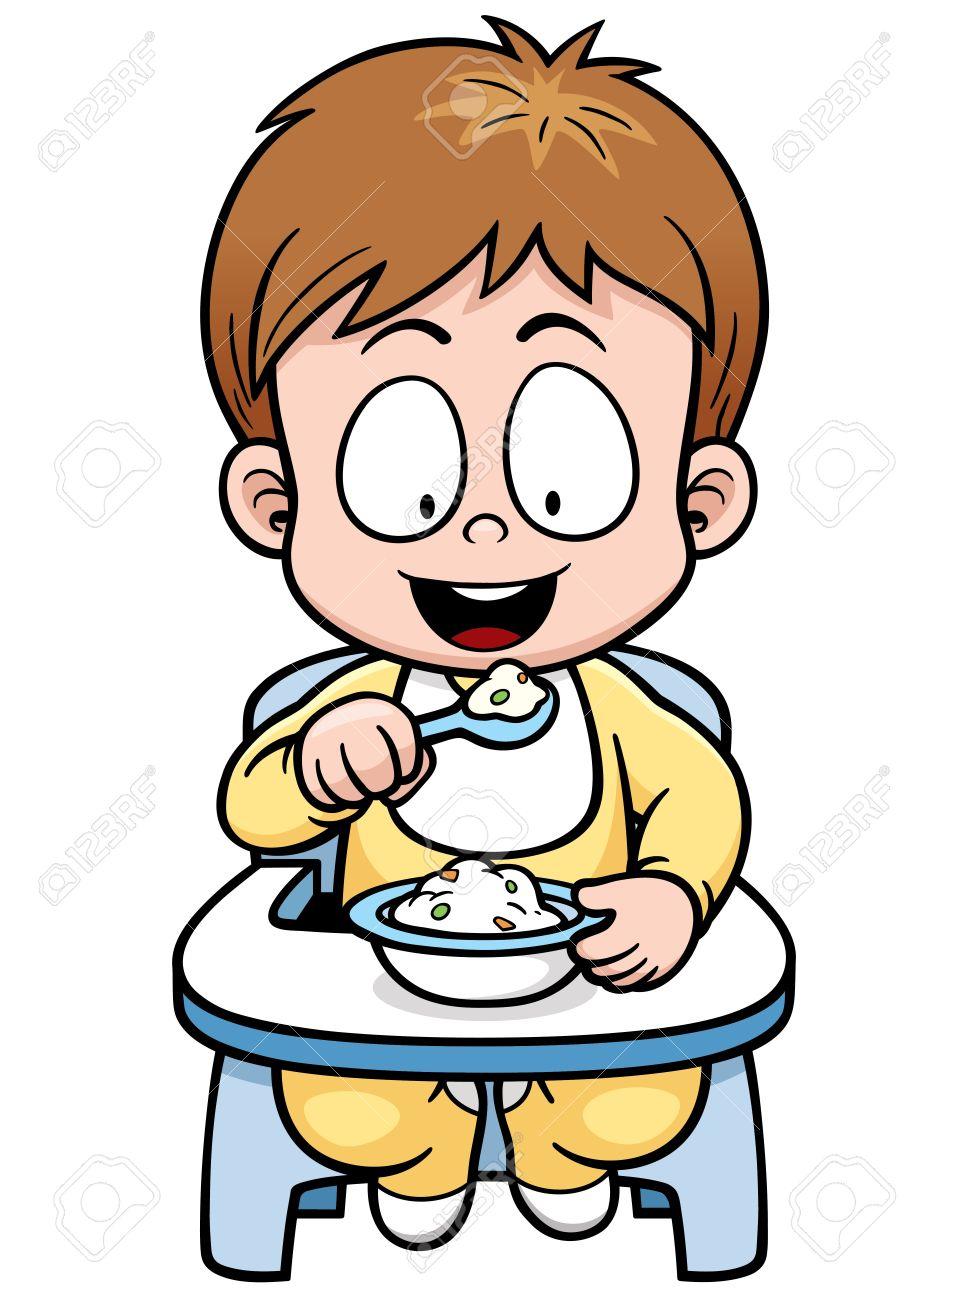 Vector illustration of cartoon baby eating.